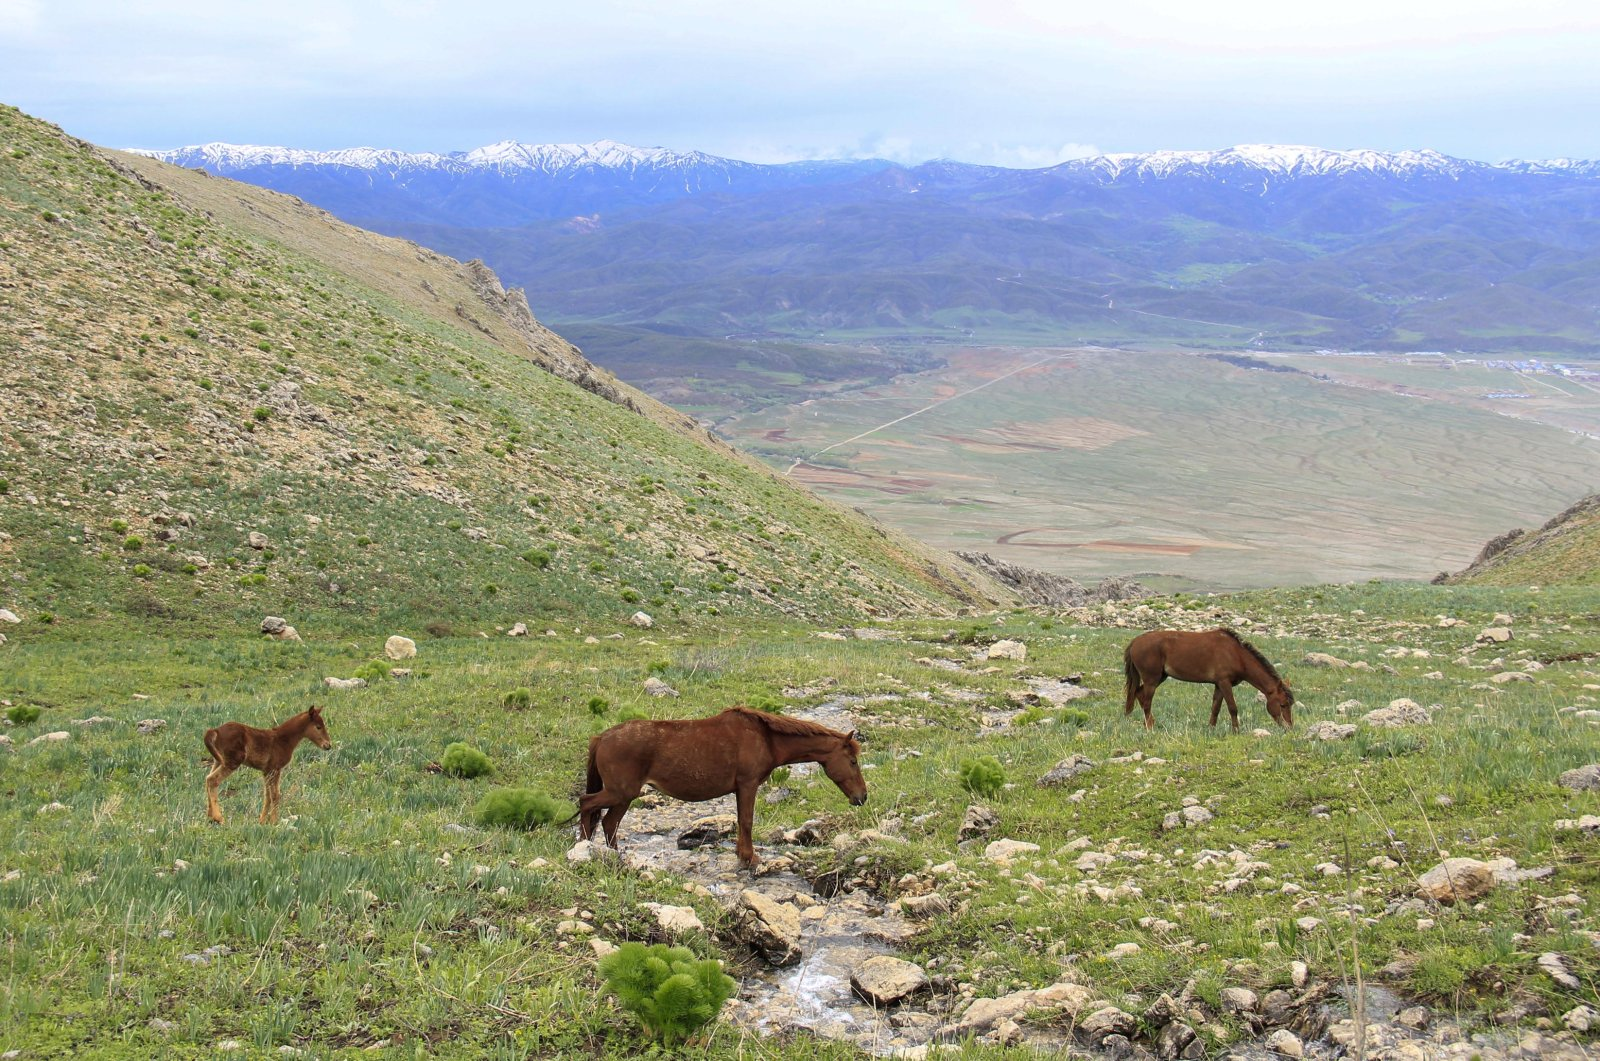 Yılkı horses graze the grassy plateaus of the Mercan Mountains in the Ovacık district of Tunceli province, Turkey, May 11, 2020. (AA Photo)